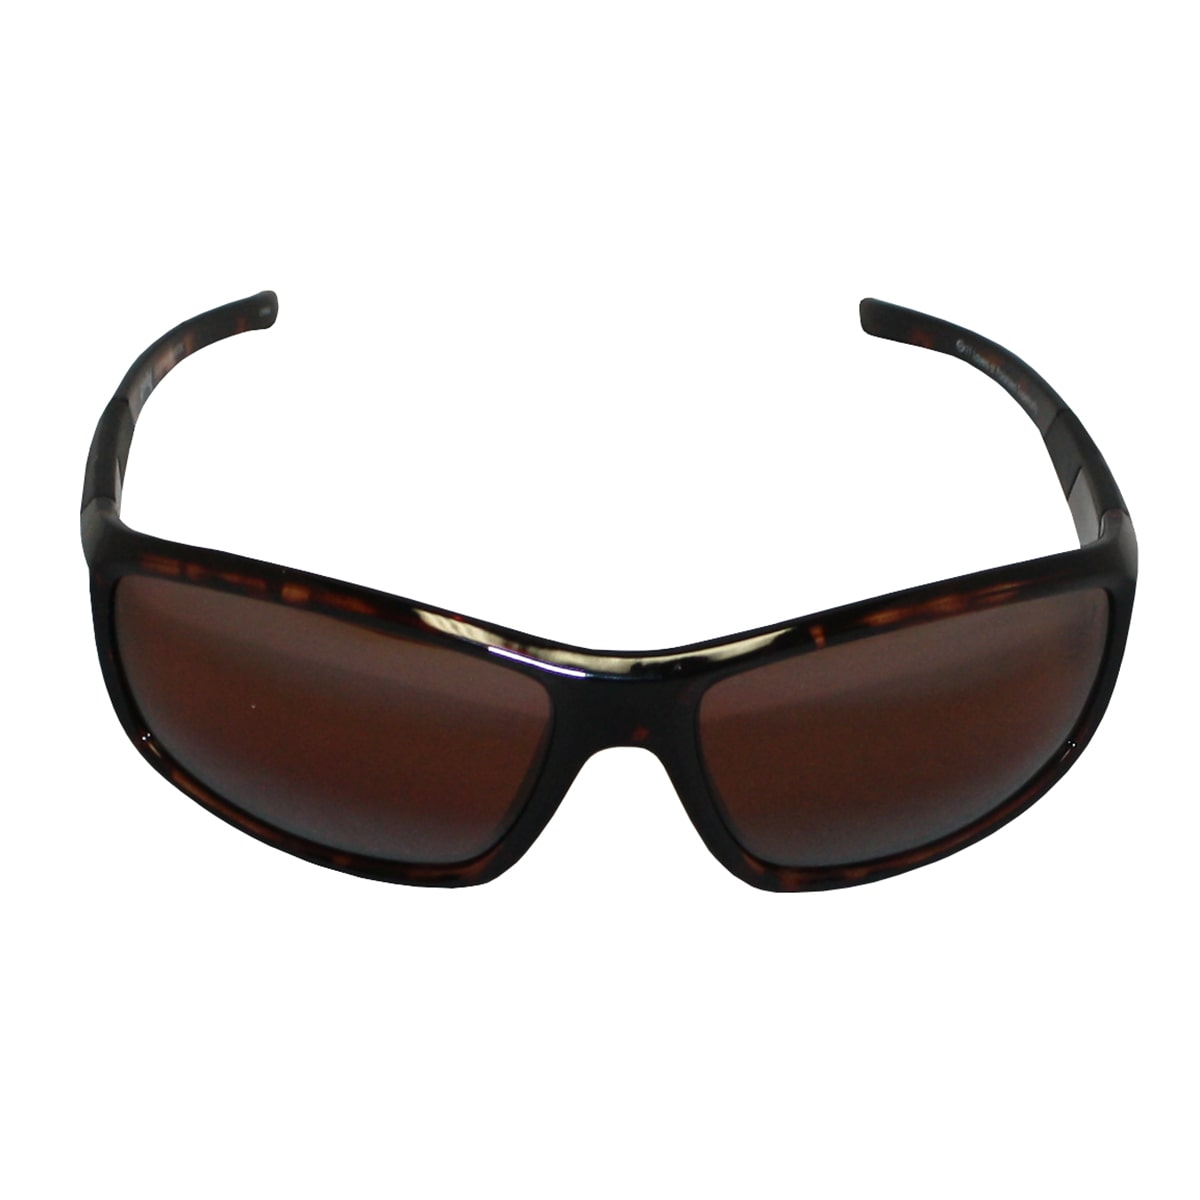 bb74550fcc Strike King Lures - Strike King Lures S11 Optics Sunglasses Bristol Style